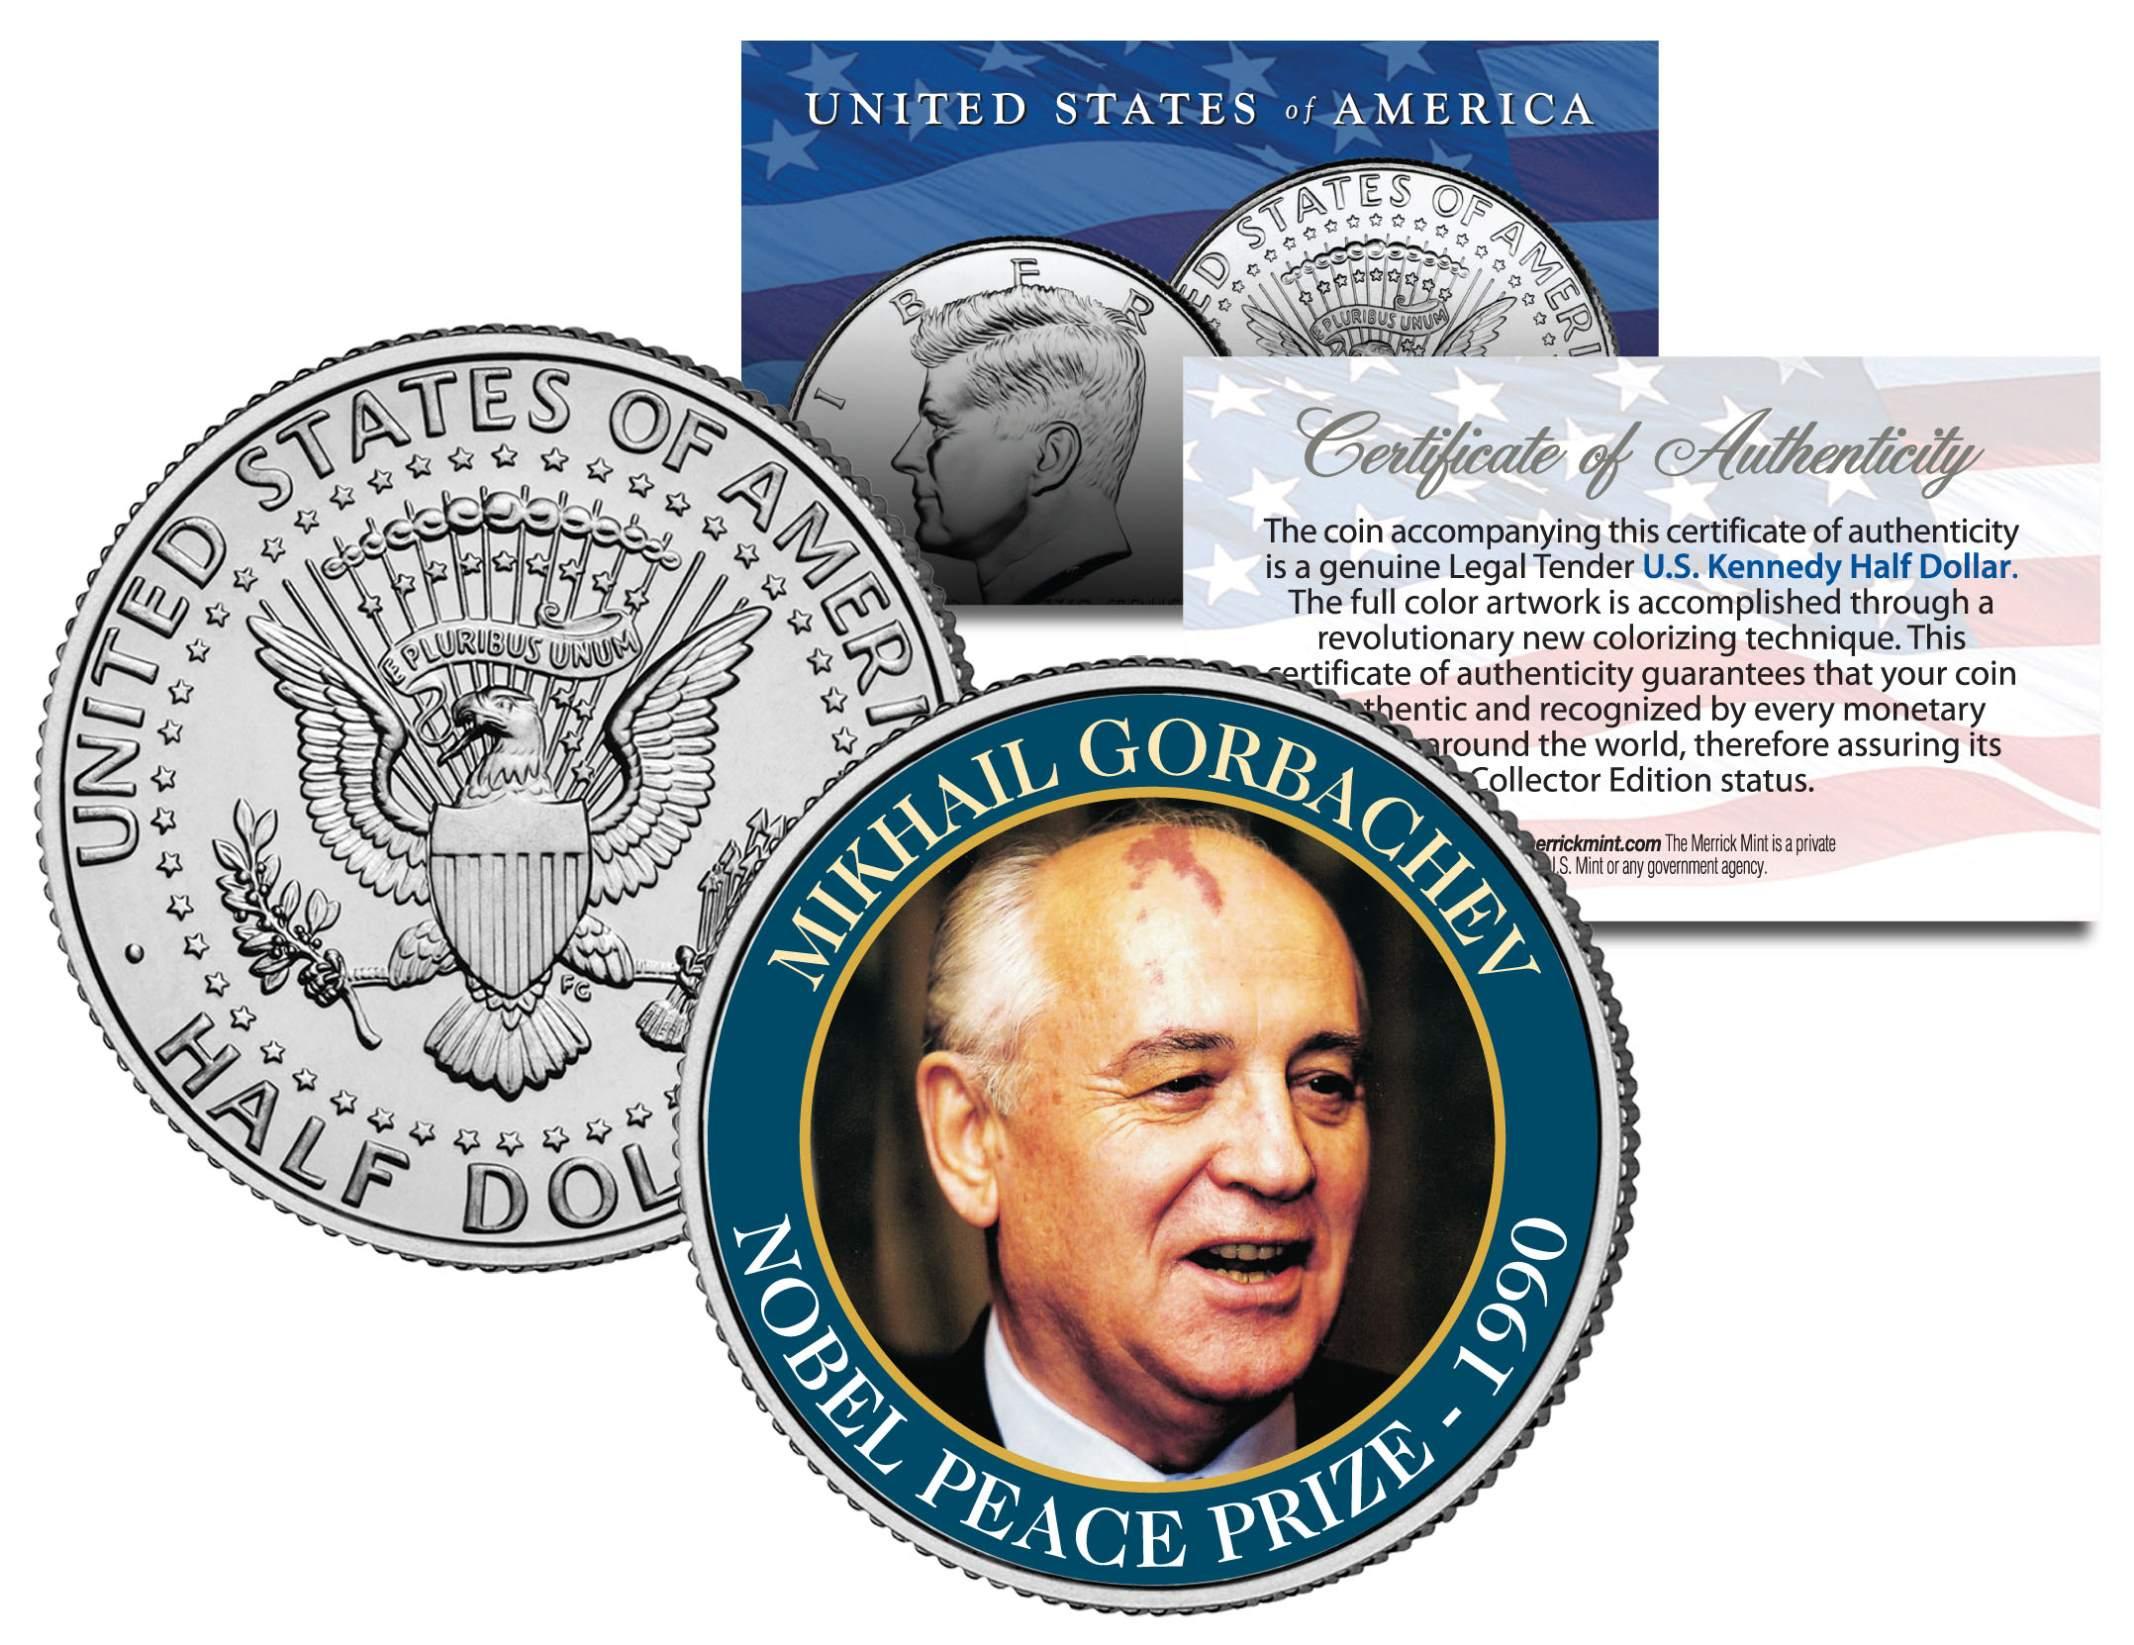 MIKHAIL GORBACHEV Coin Colorized JFK Half Dollar U.S 1990 NOBEL PEACE PRIZE